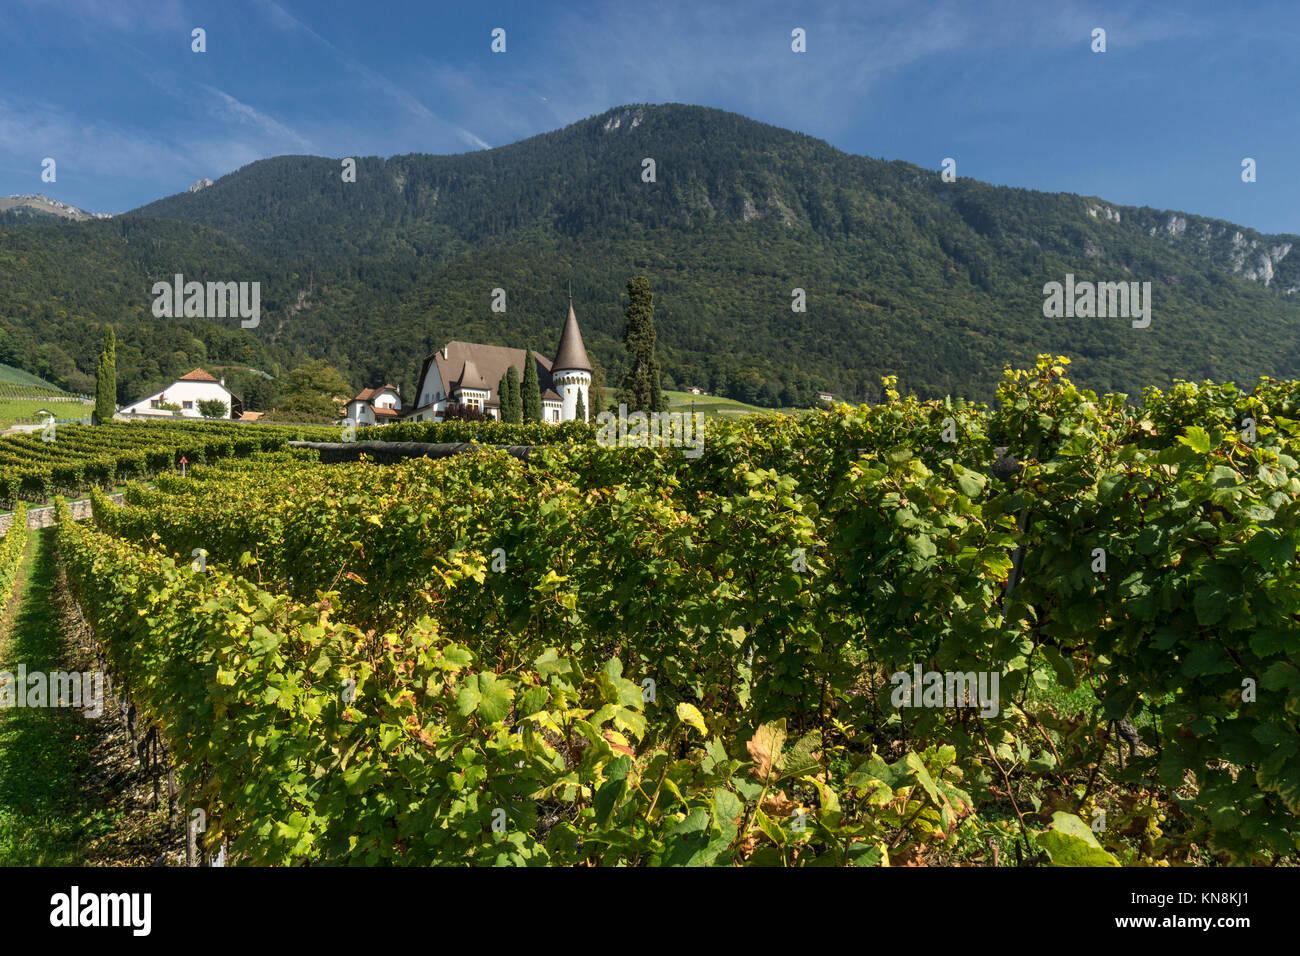 Chateau Maison Blanche, Vineyards , Yvorne,  Lavaux region, Lake Geneva, Swiss Alps,  Switzerland - Stock Image